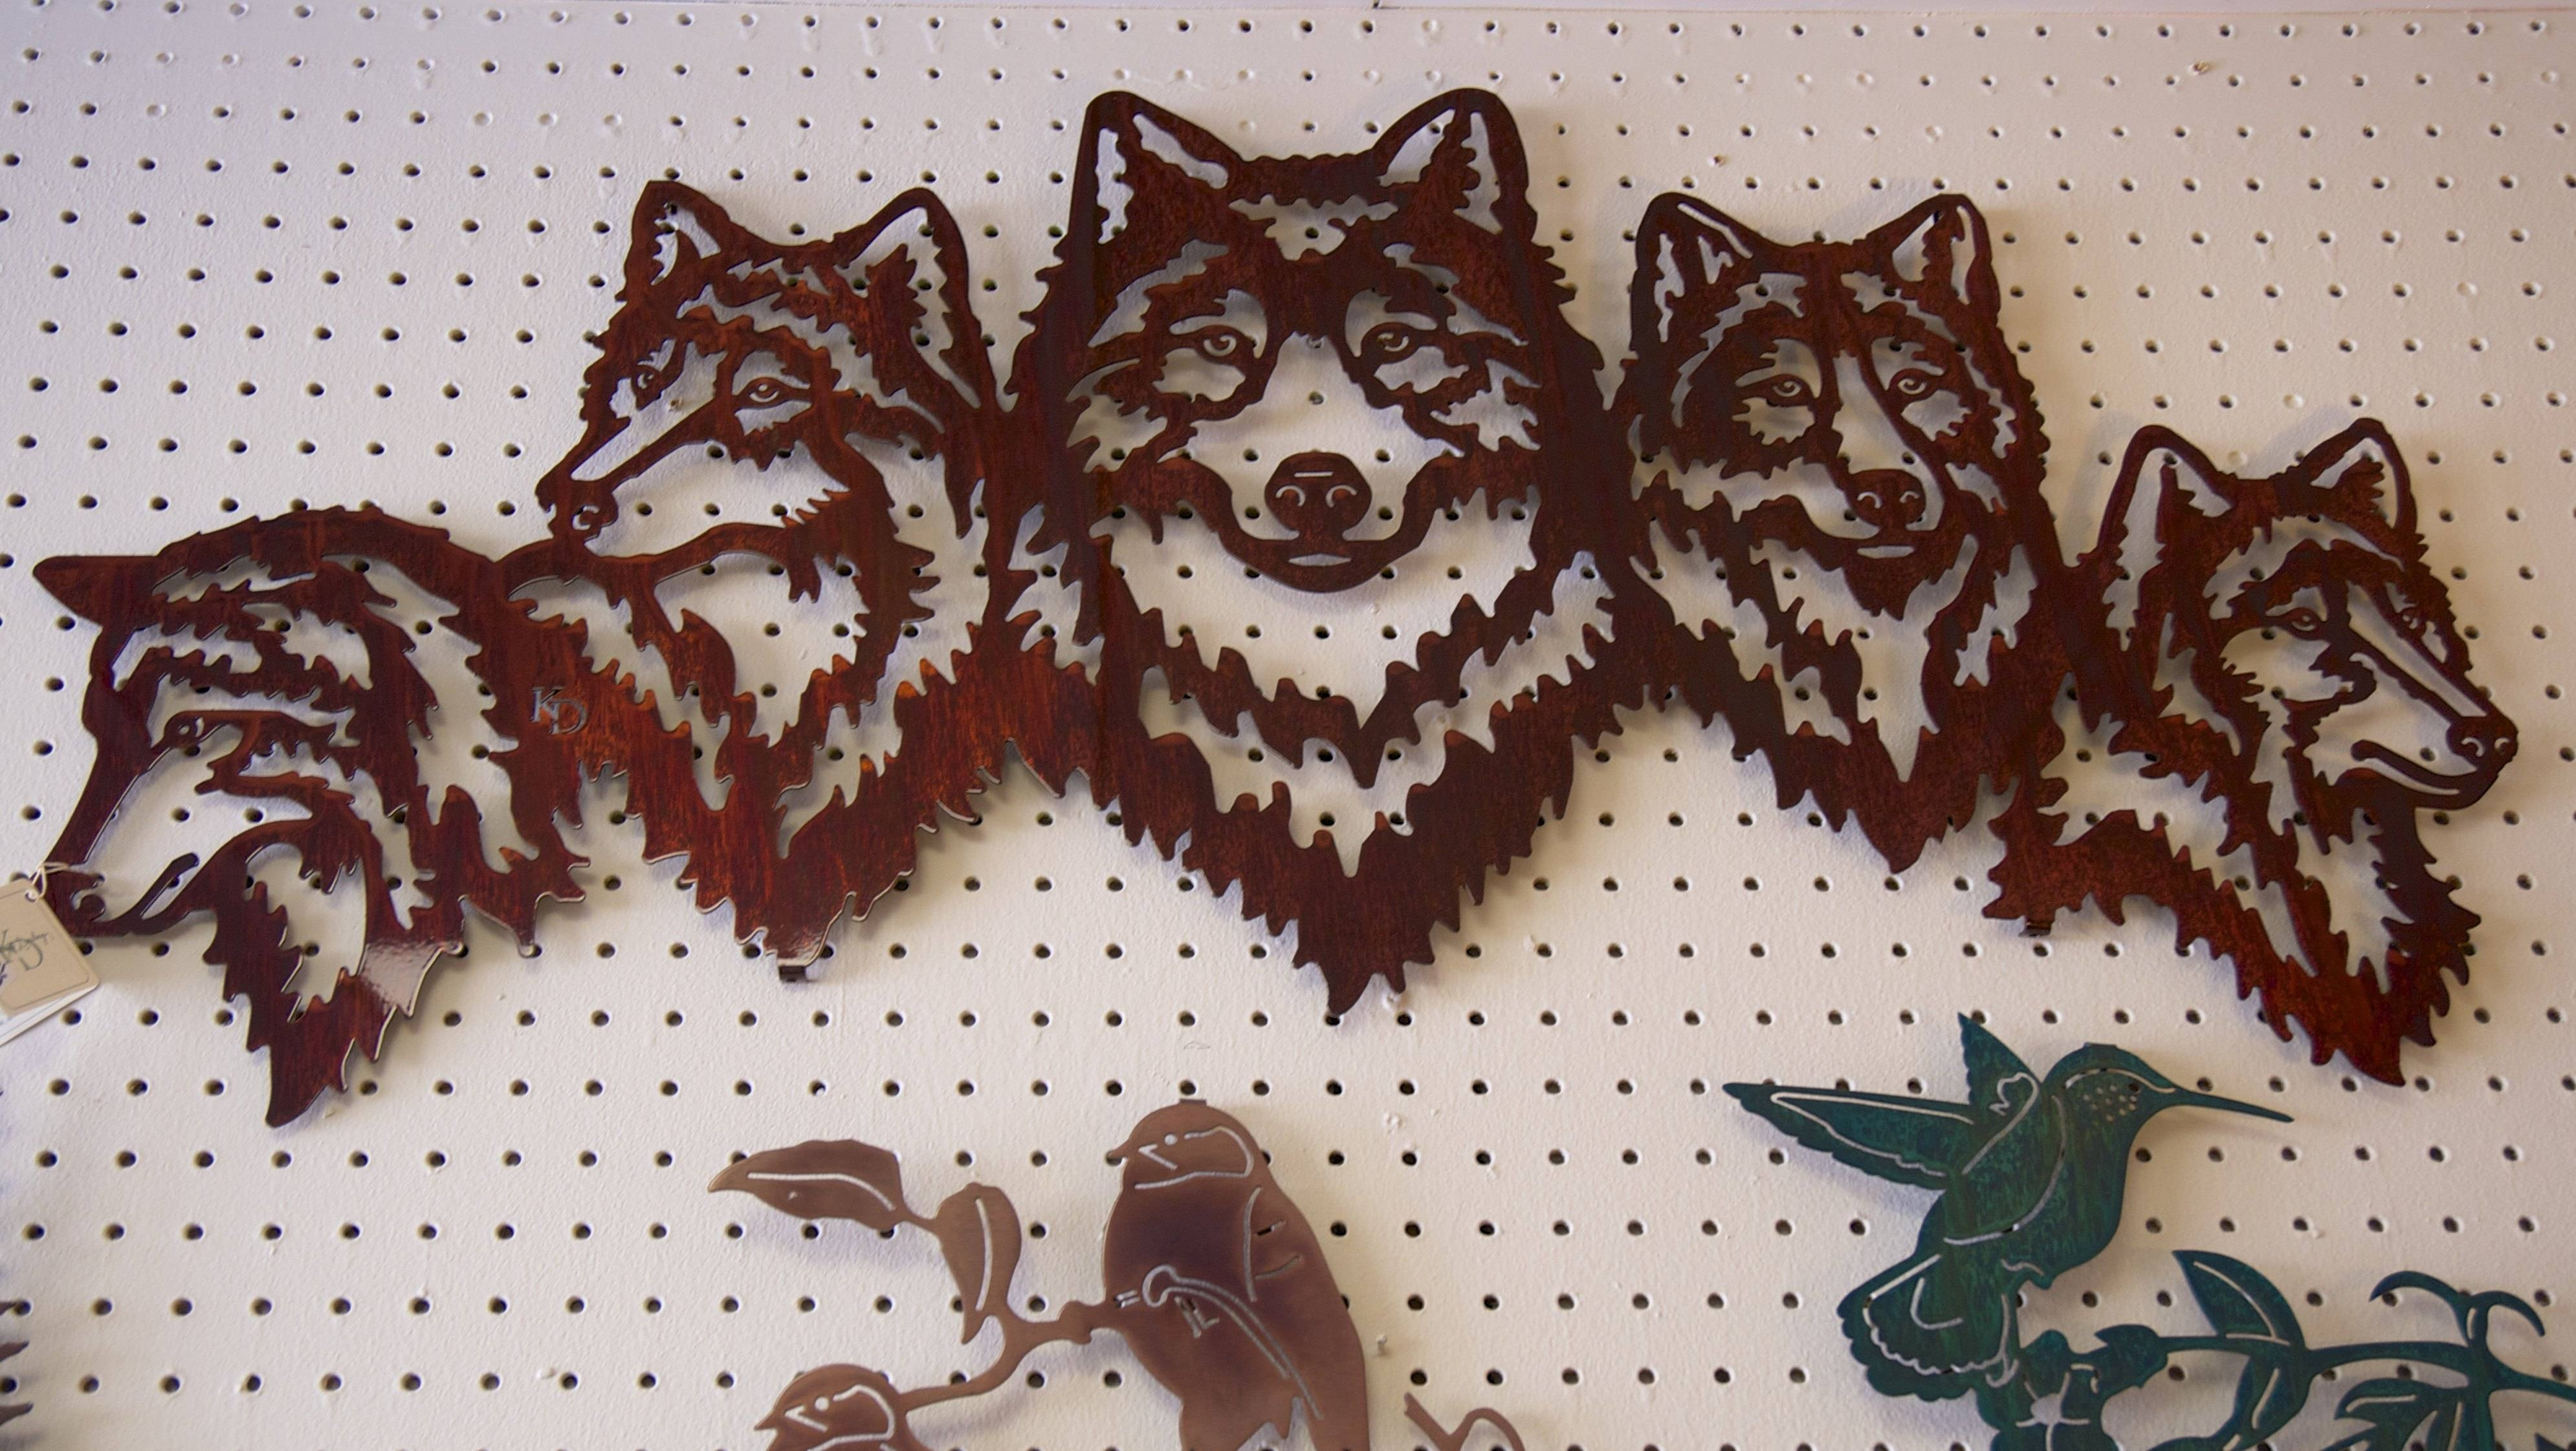 Wall Art – Metal Artisan Sculptures | Wood Magic For 2017 Animal Metal Wall Art (View 17 of 20)